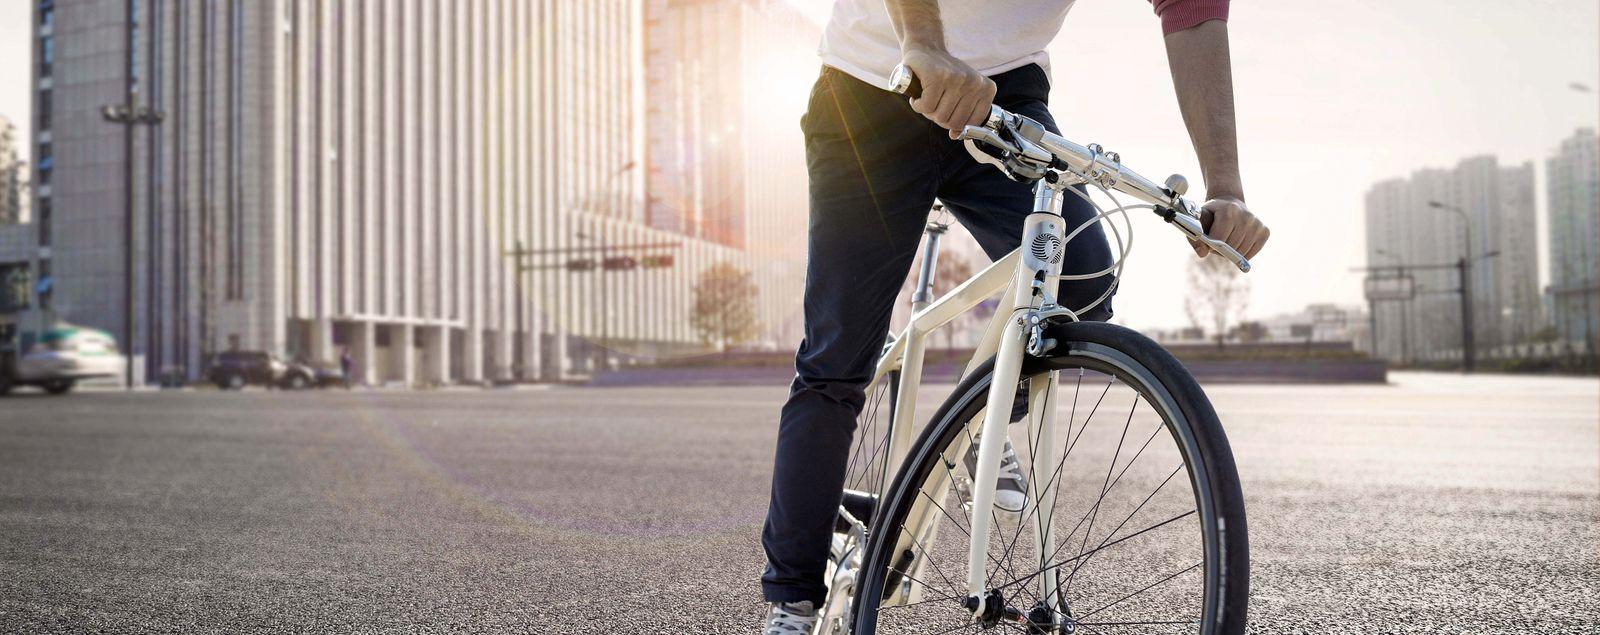 Freygeist / E-Bike